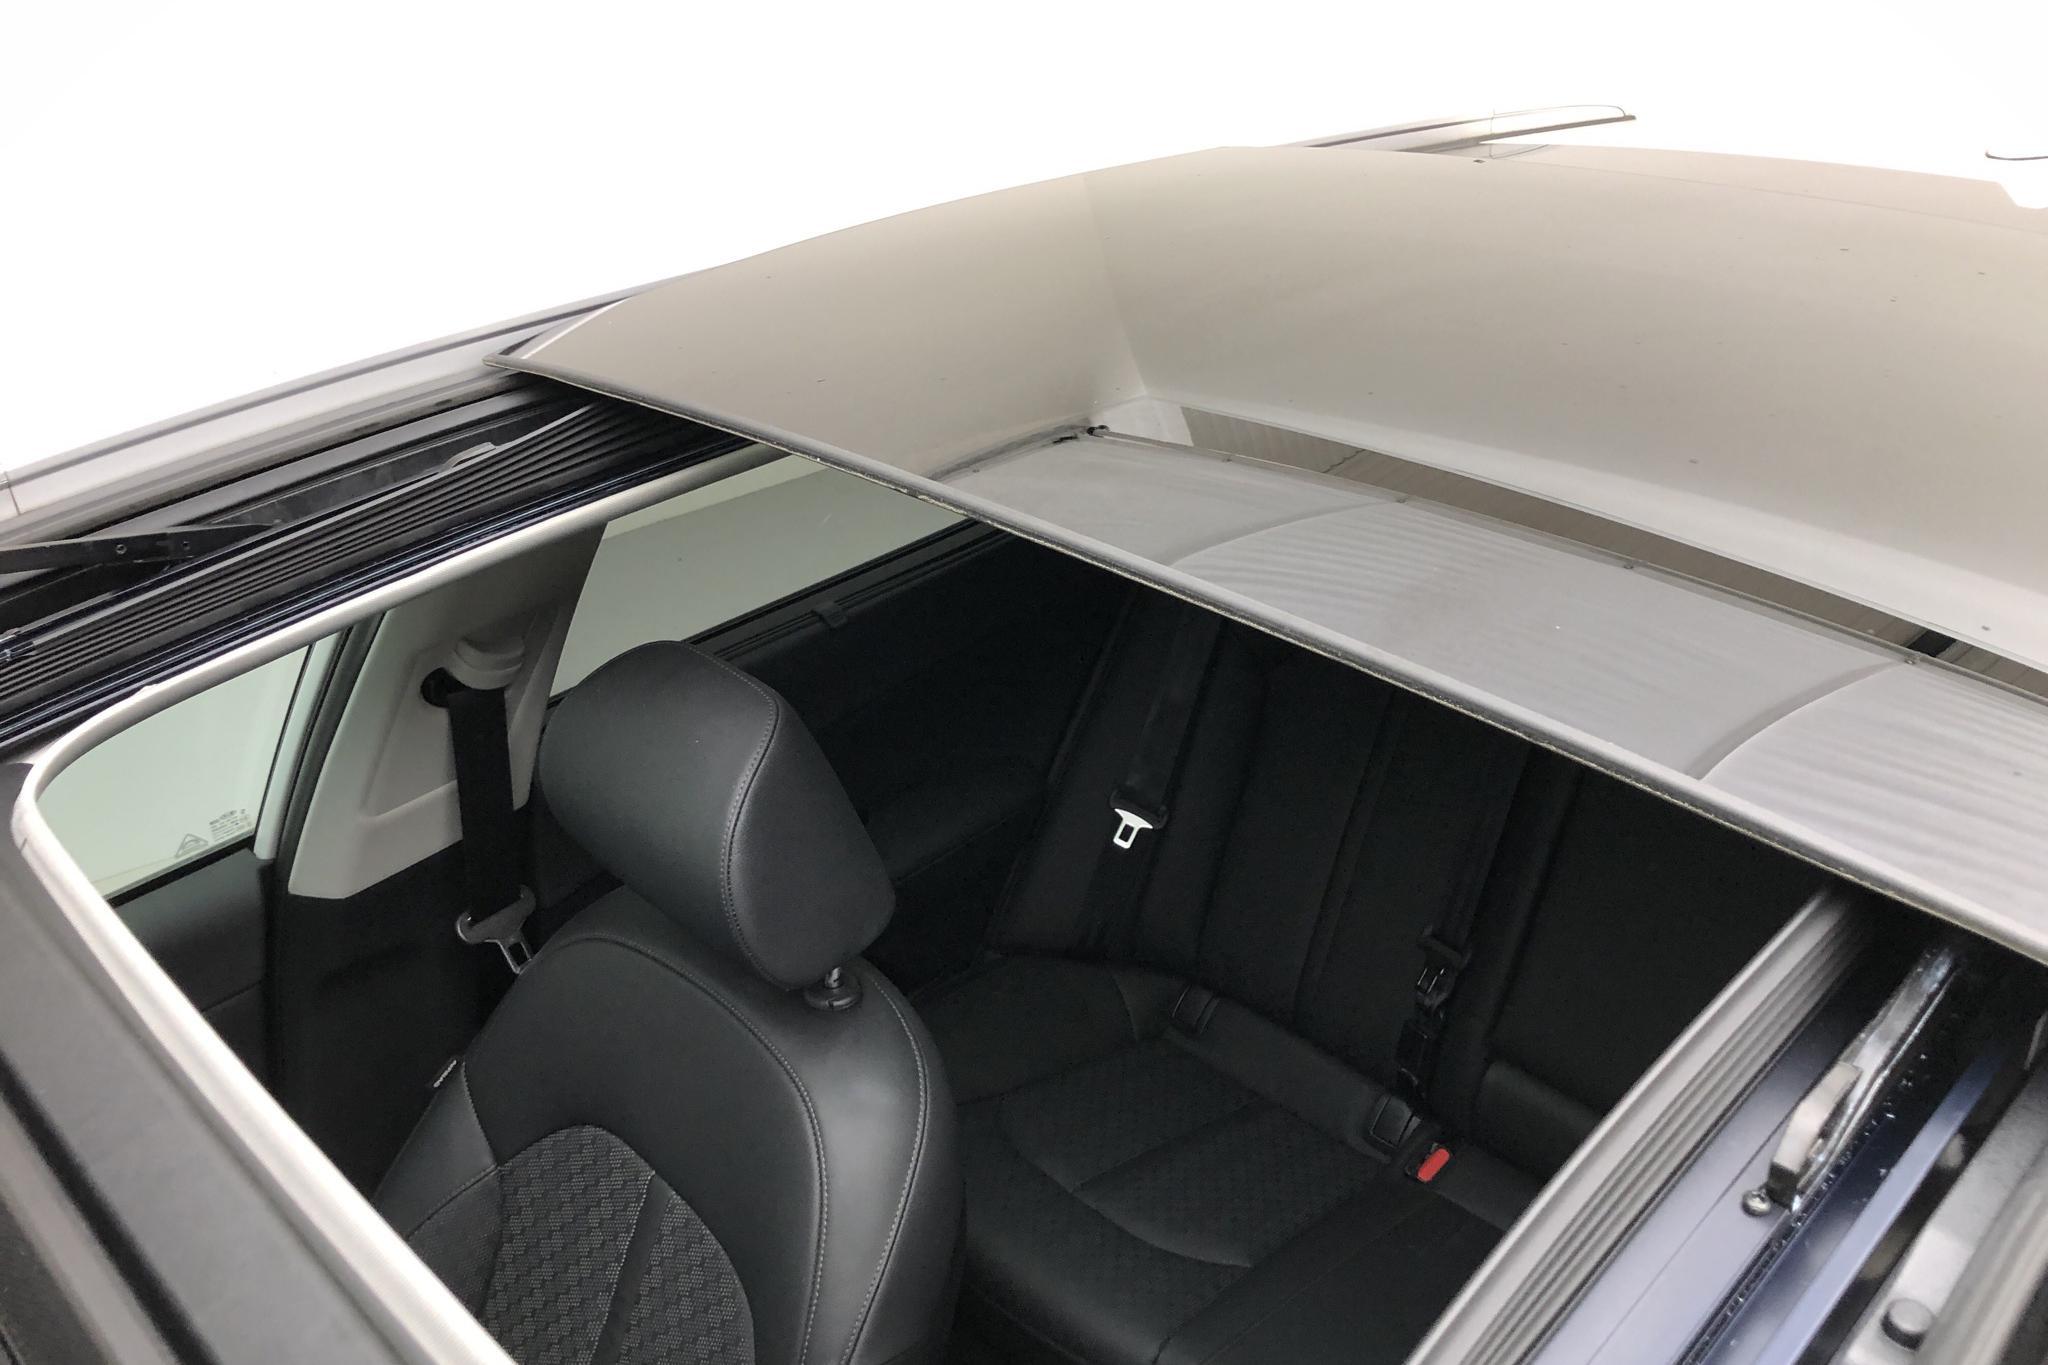 KIA Optima 2.0 GDi Plug-in Hybrid SW (205hk) - 51 820 km - Automatic - white - 2018